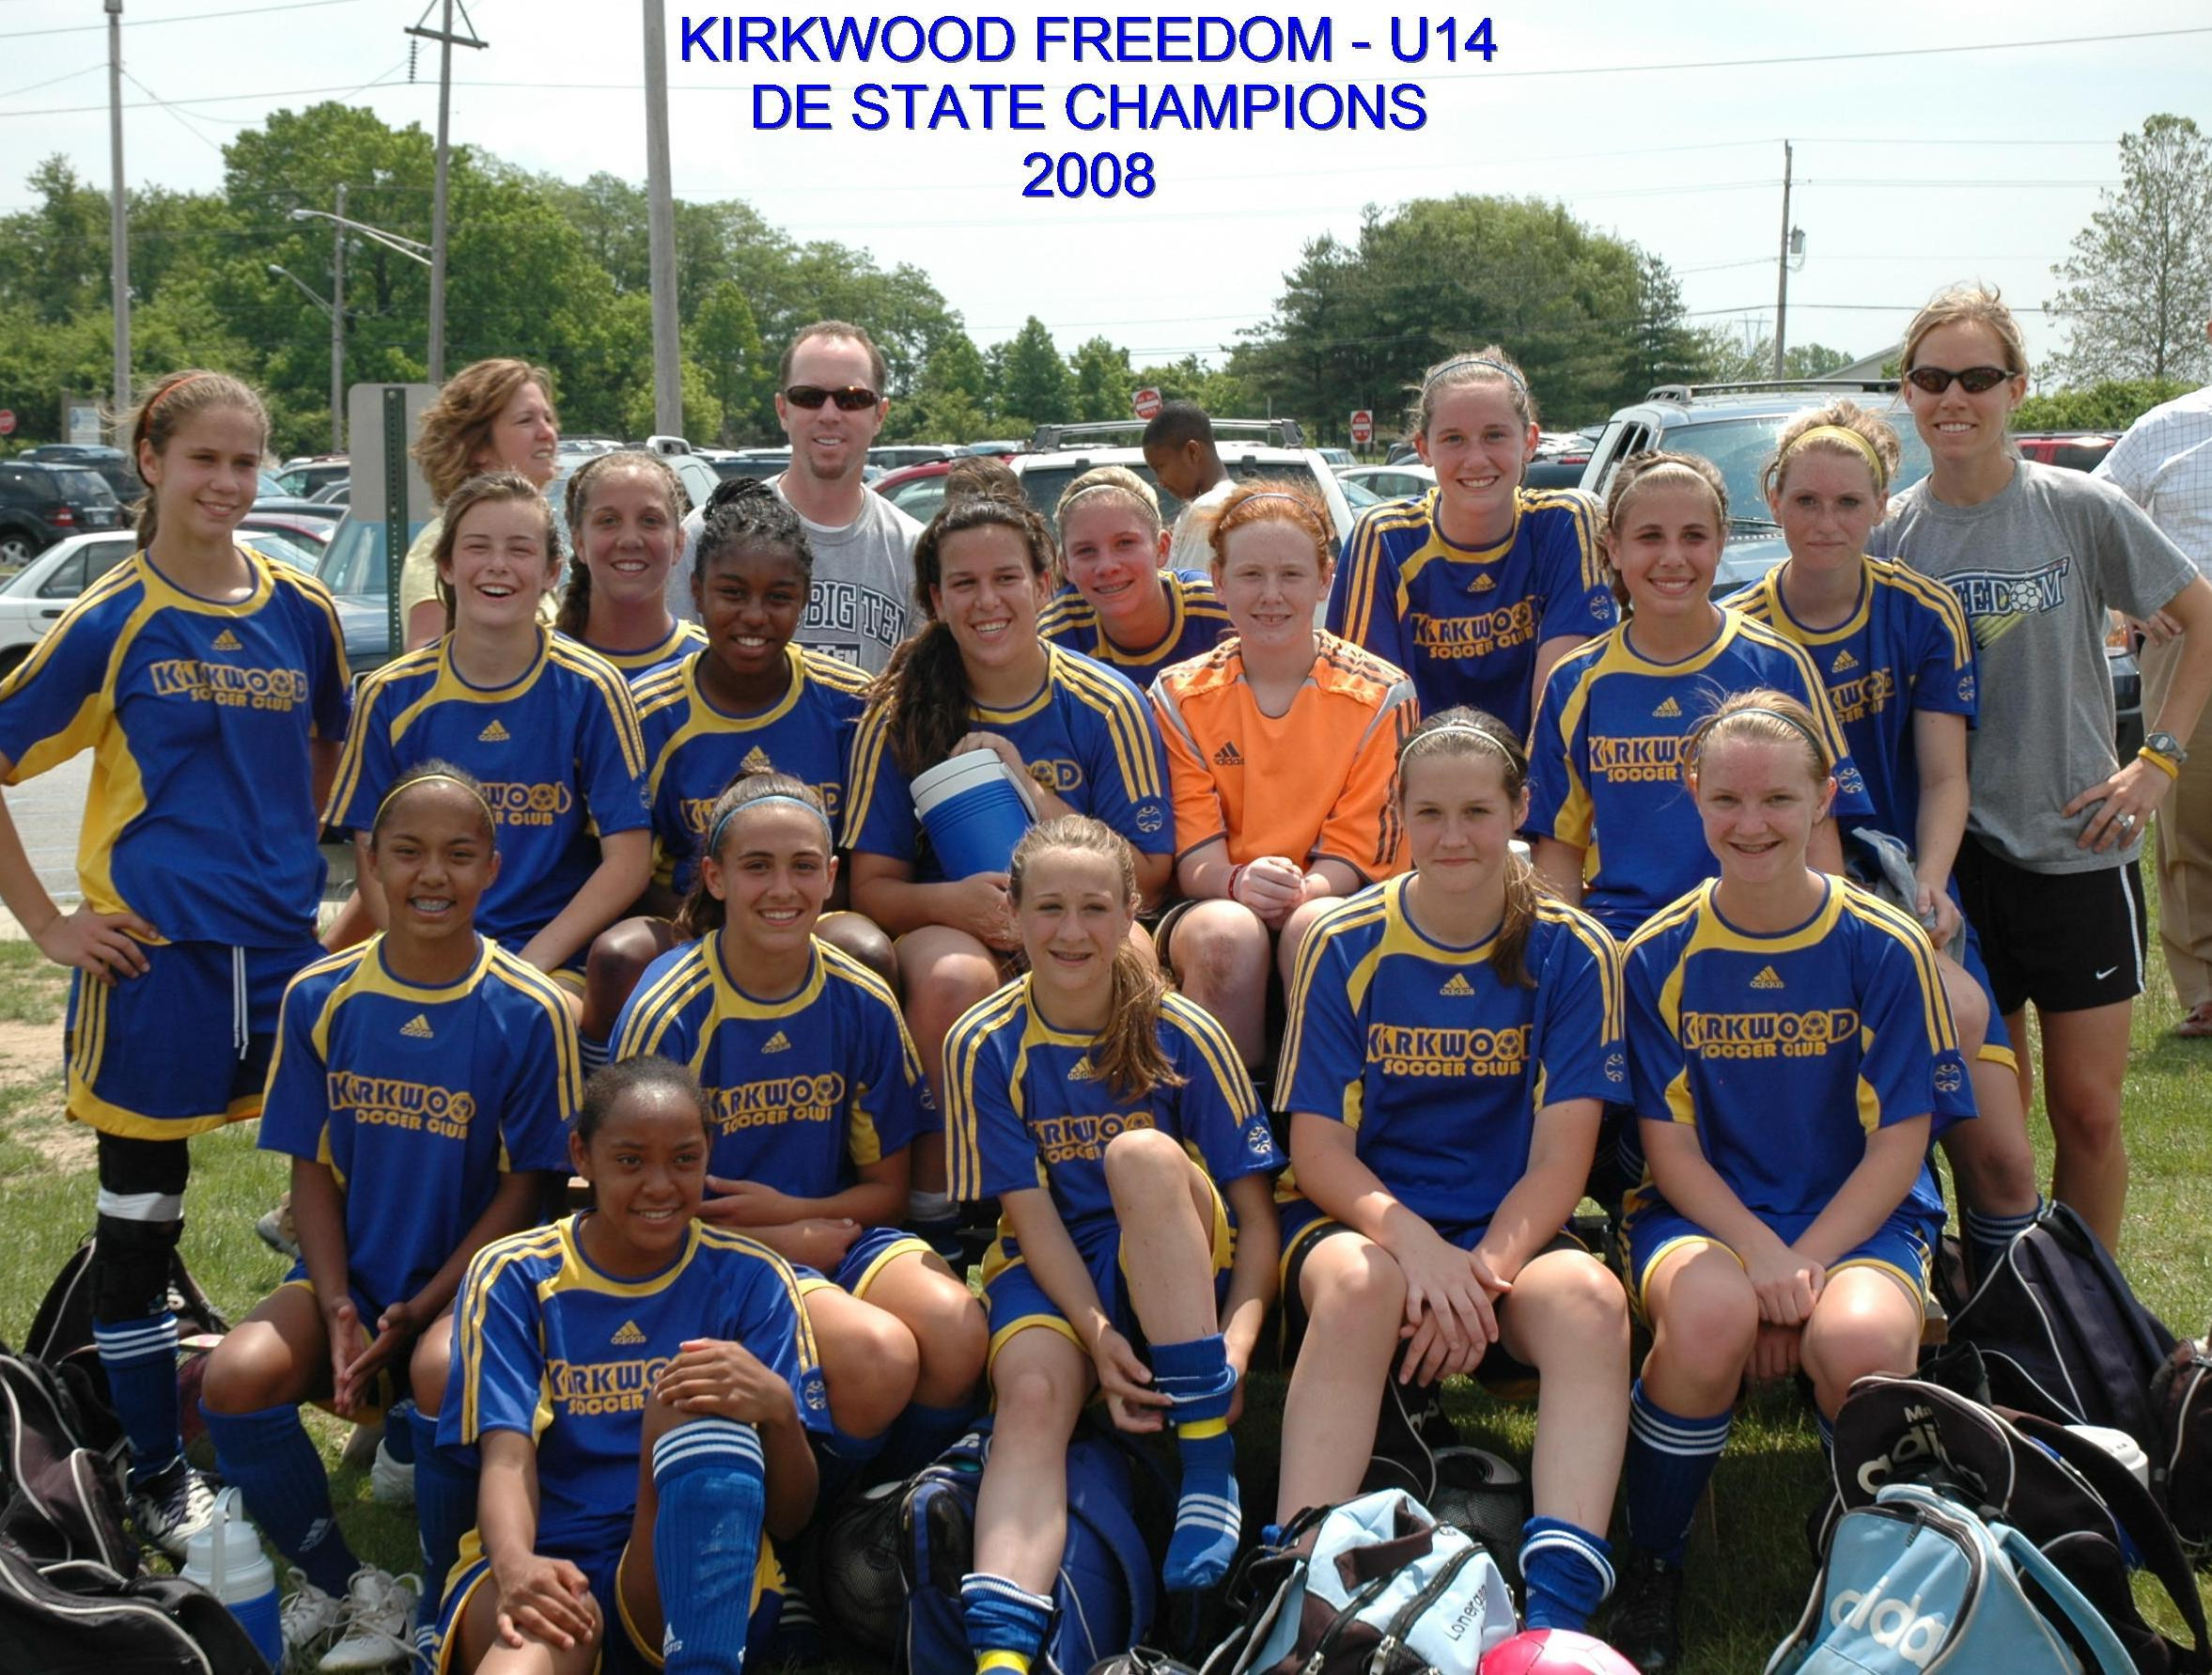 2008 DE State Champs